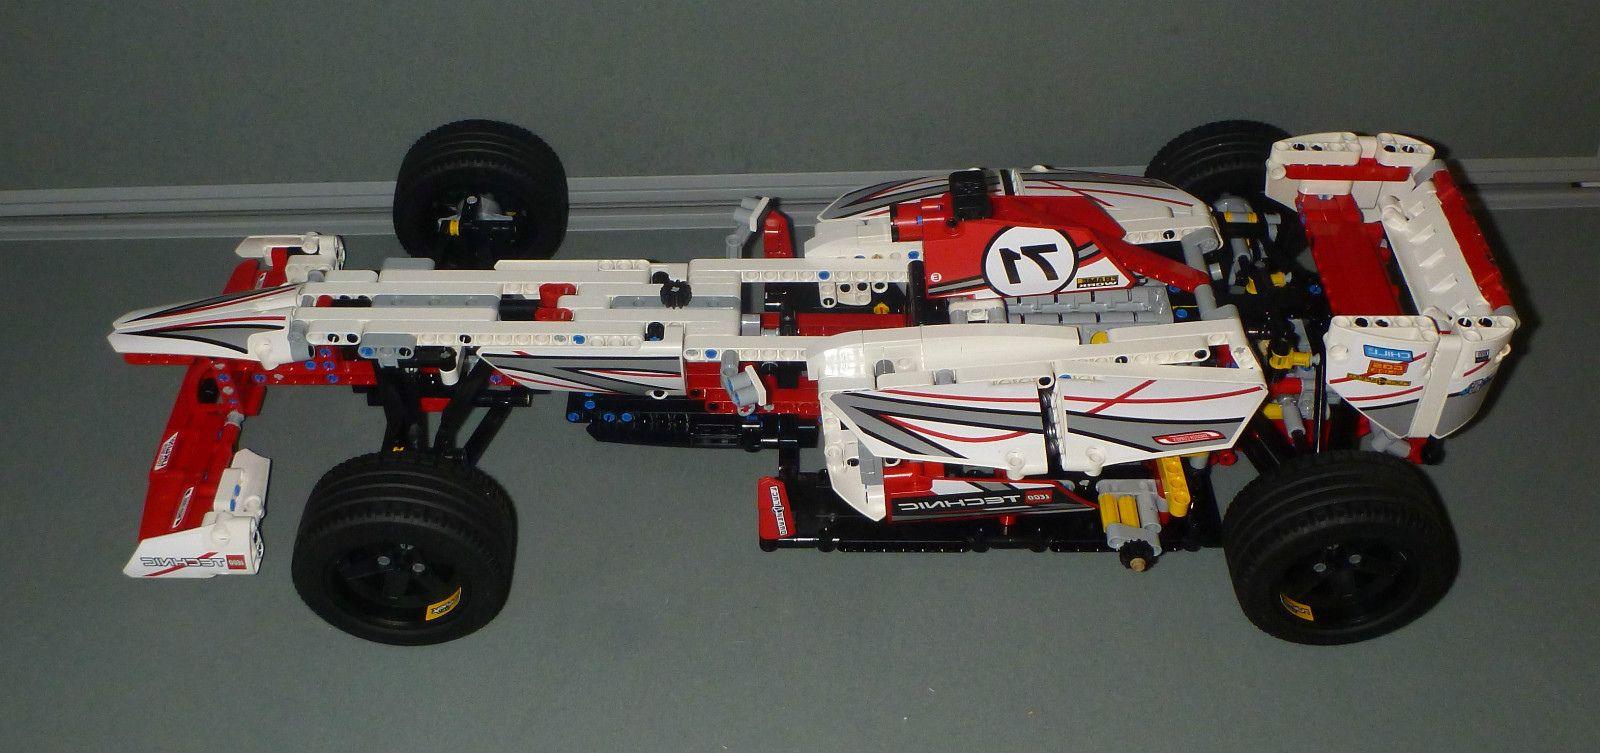 lego 42000 grand prix racer - photo #7